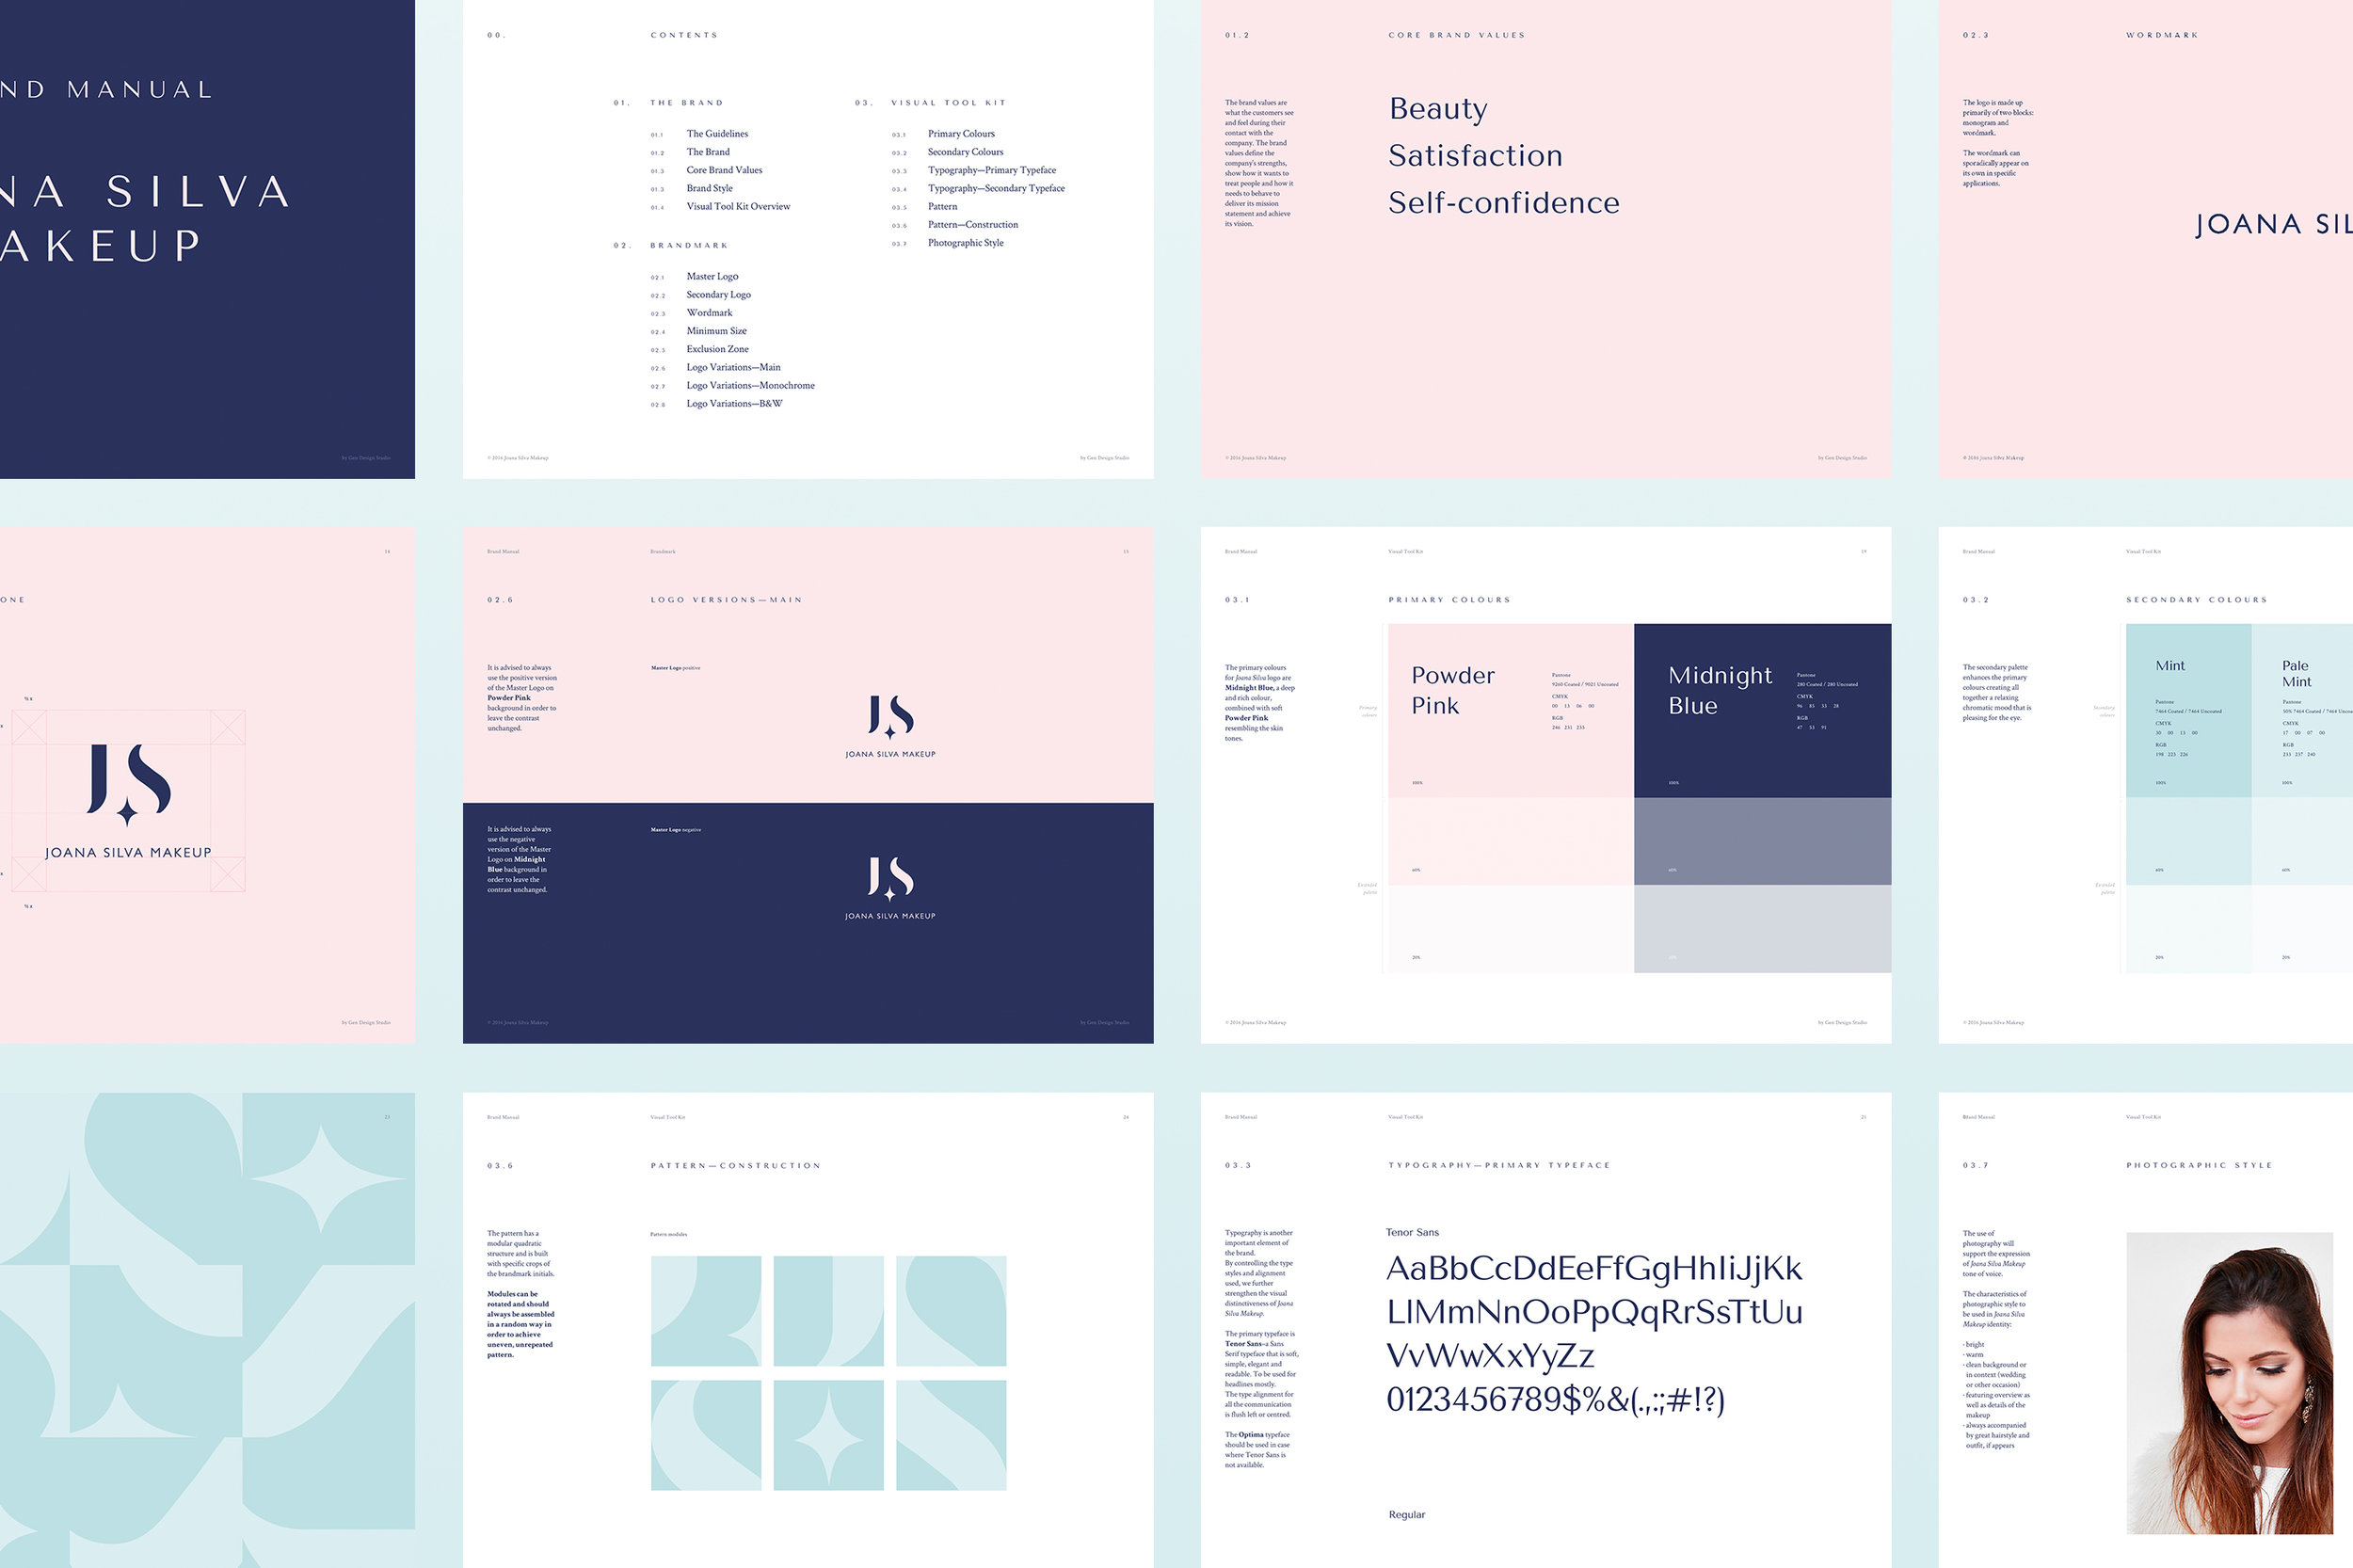 Joana Silva Makeup identity brandbook by Gen Design Studio